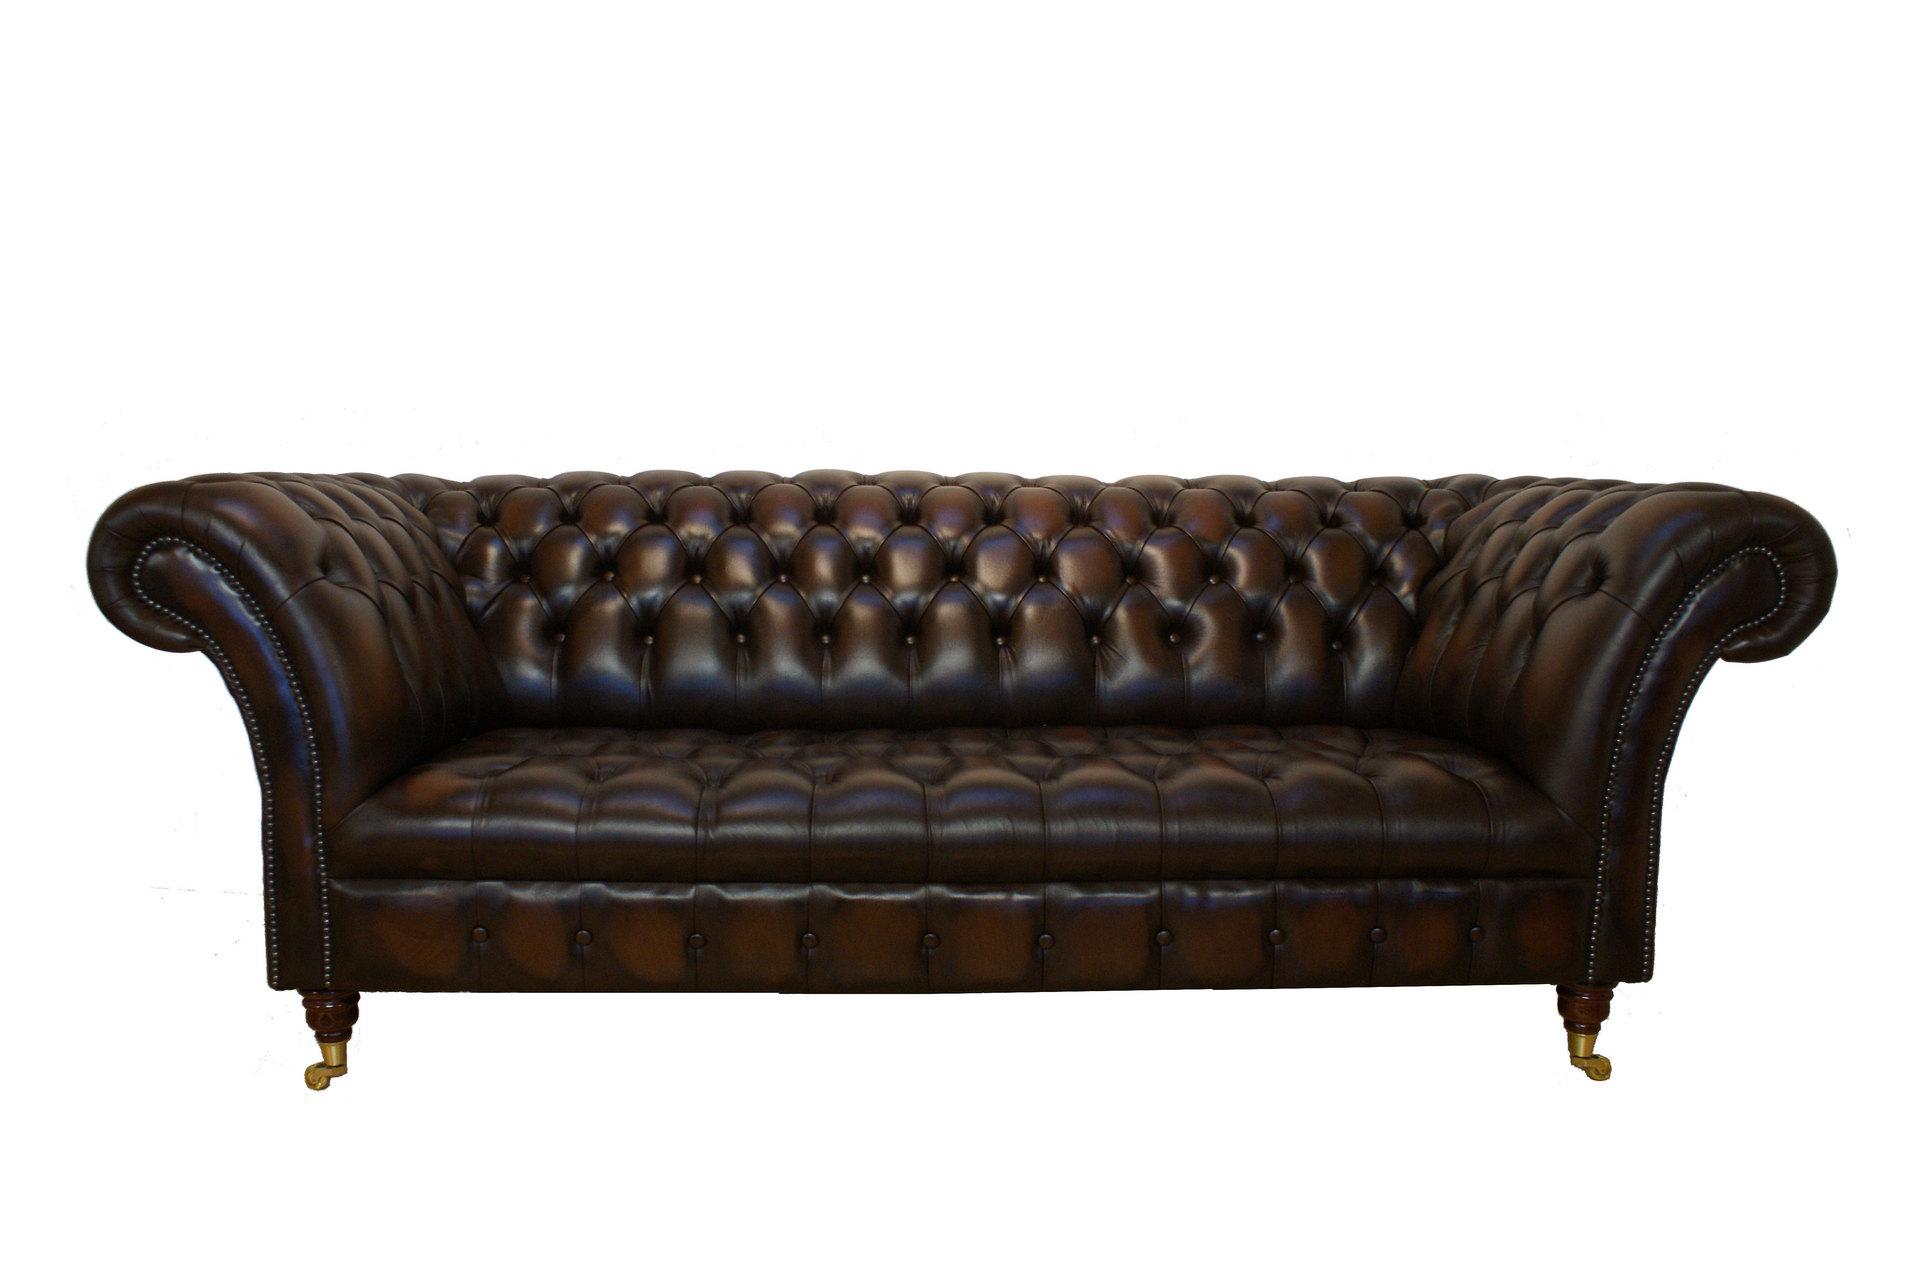 Designer Sofas For Less Uk Laura Williams